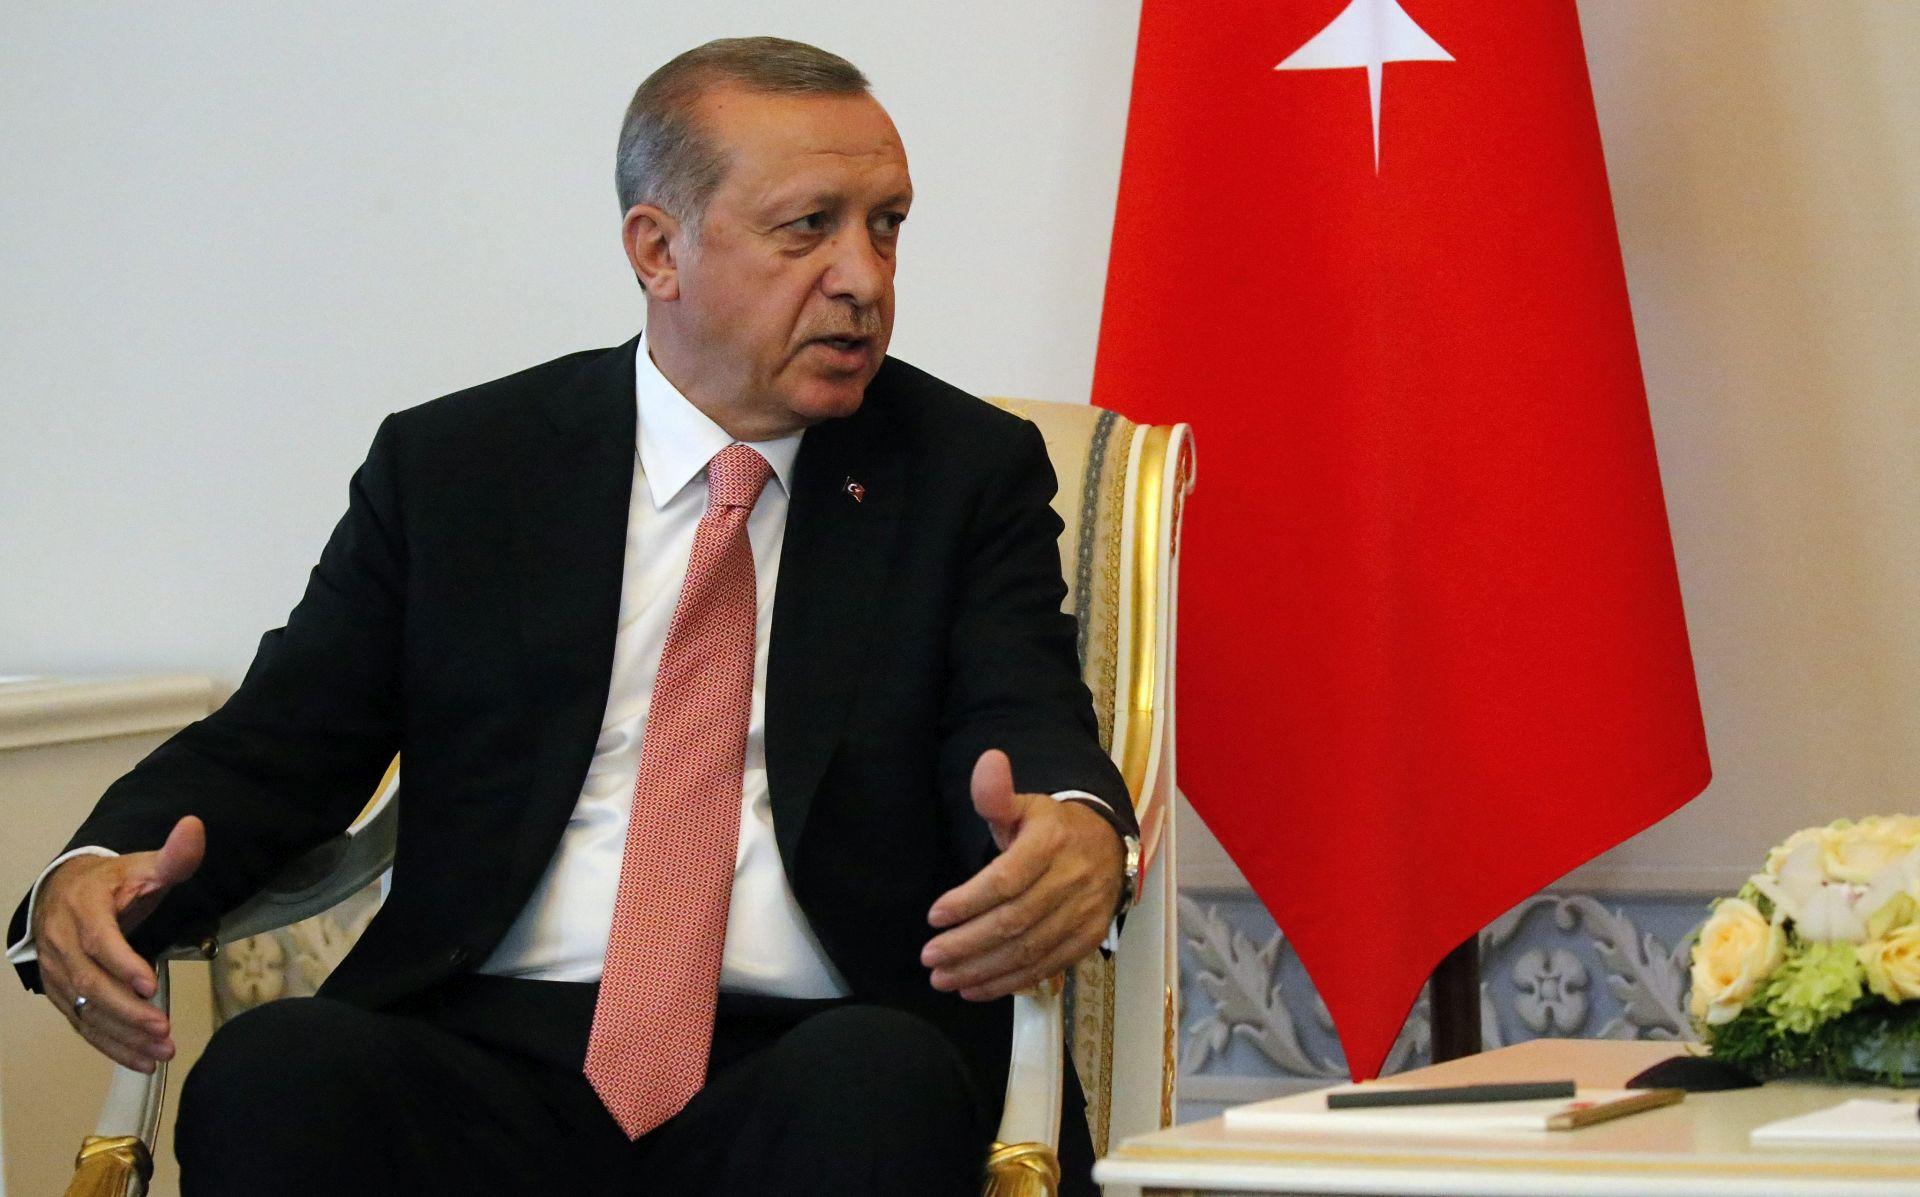 REZULTATI ANKETE: Velik porast Erdoganove popularnosti nakon puča